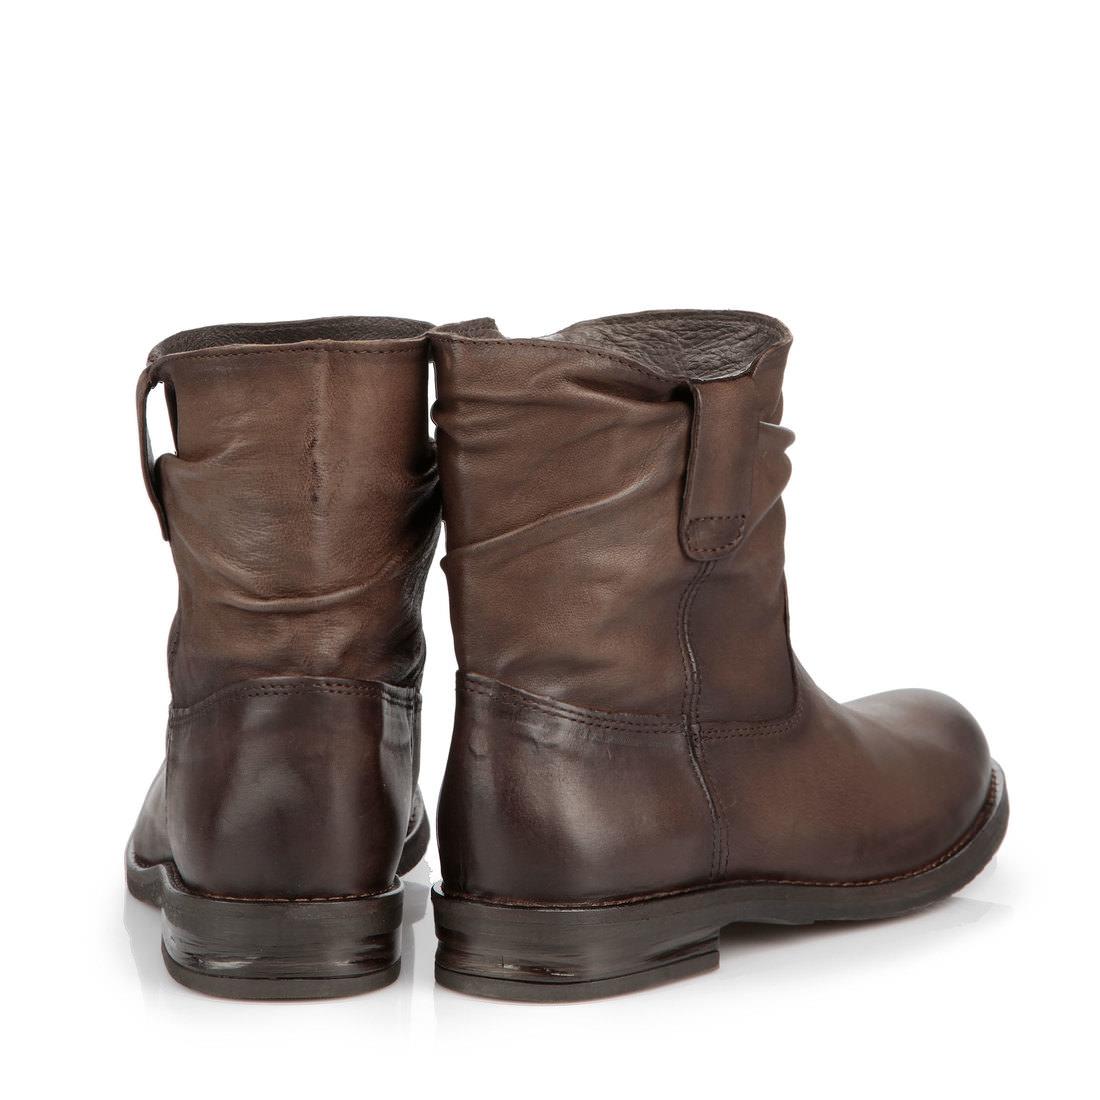 Boots Buffal marron foncéBuffalo 85arr0